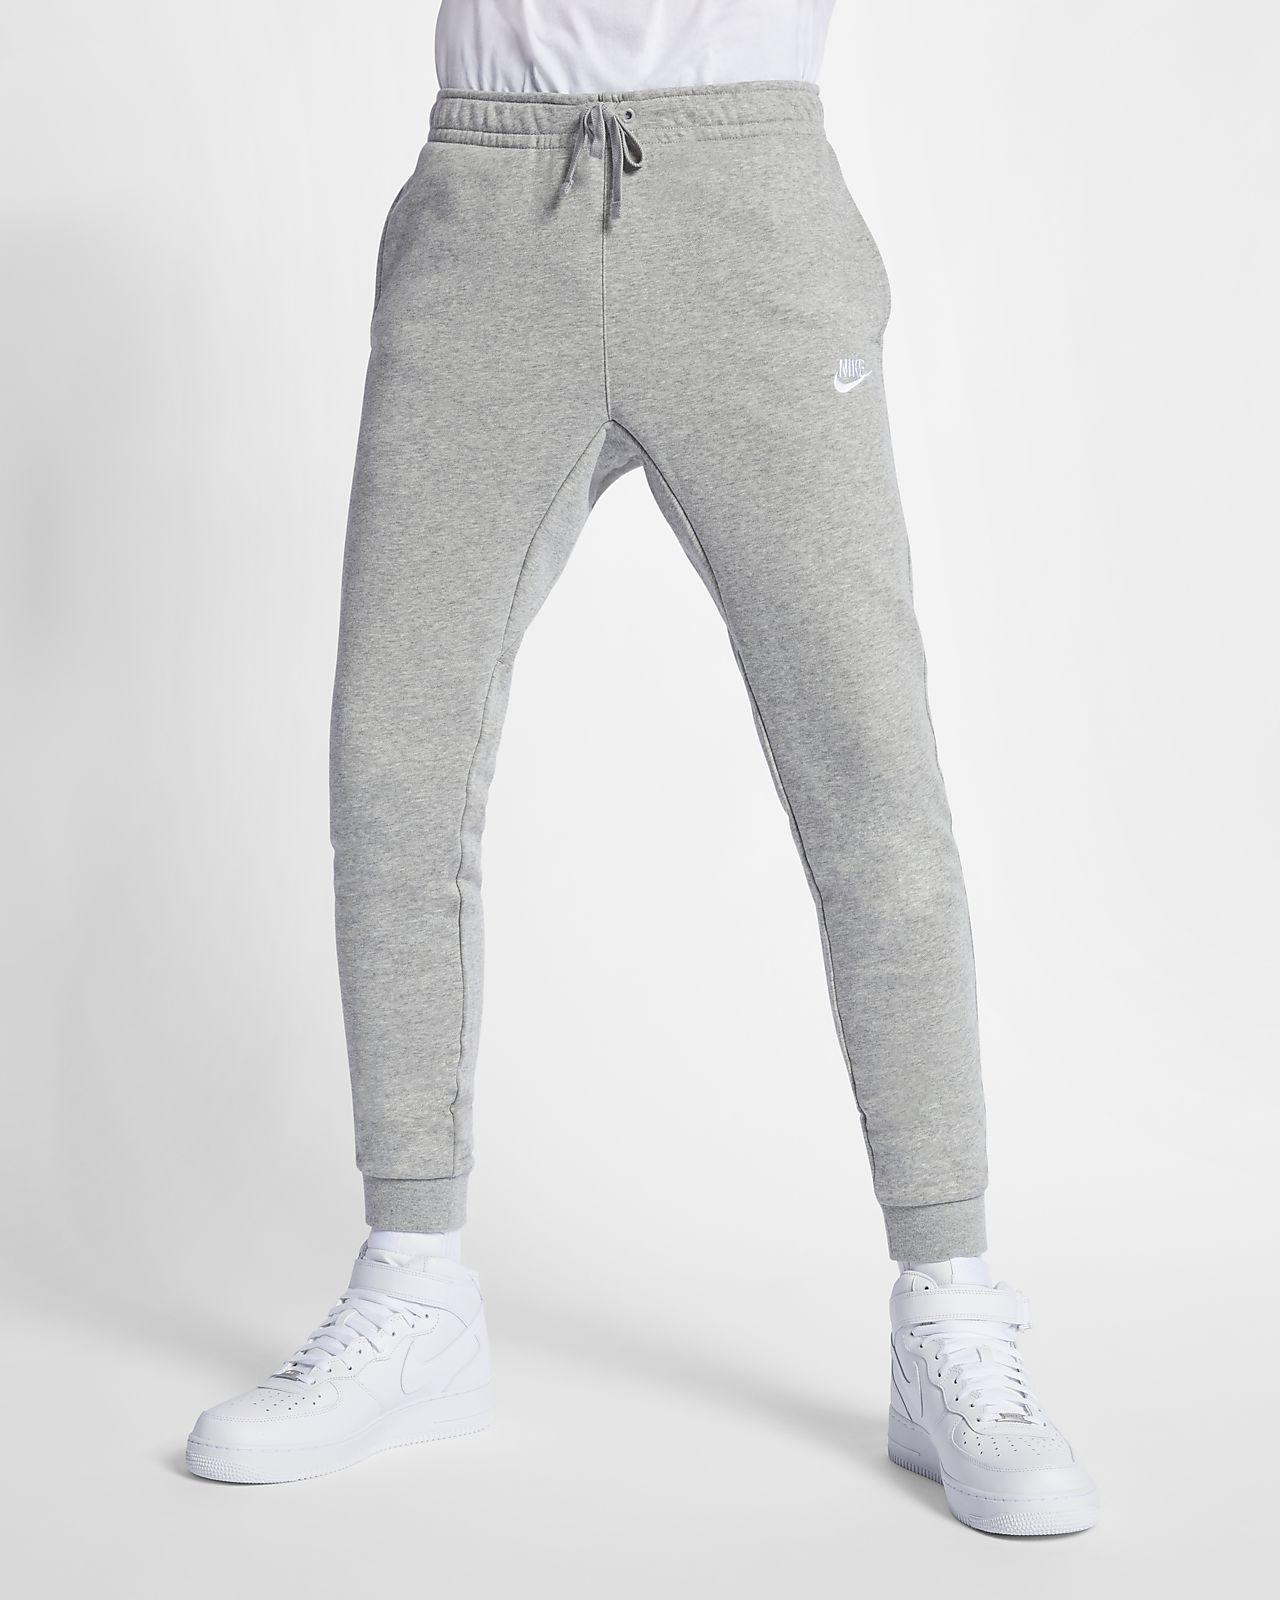 83775489fba Pantalon de jogging Nike Sportswear pour Homme. Nike.com FR